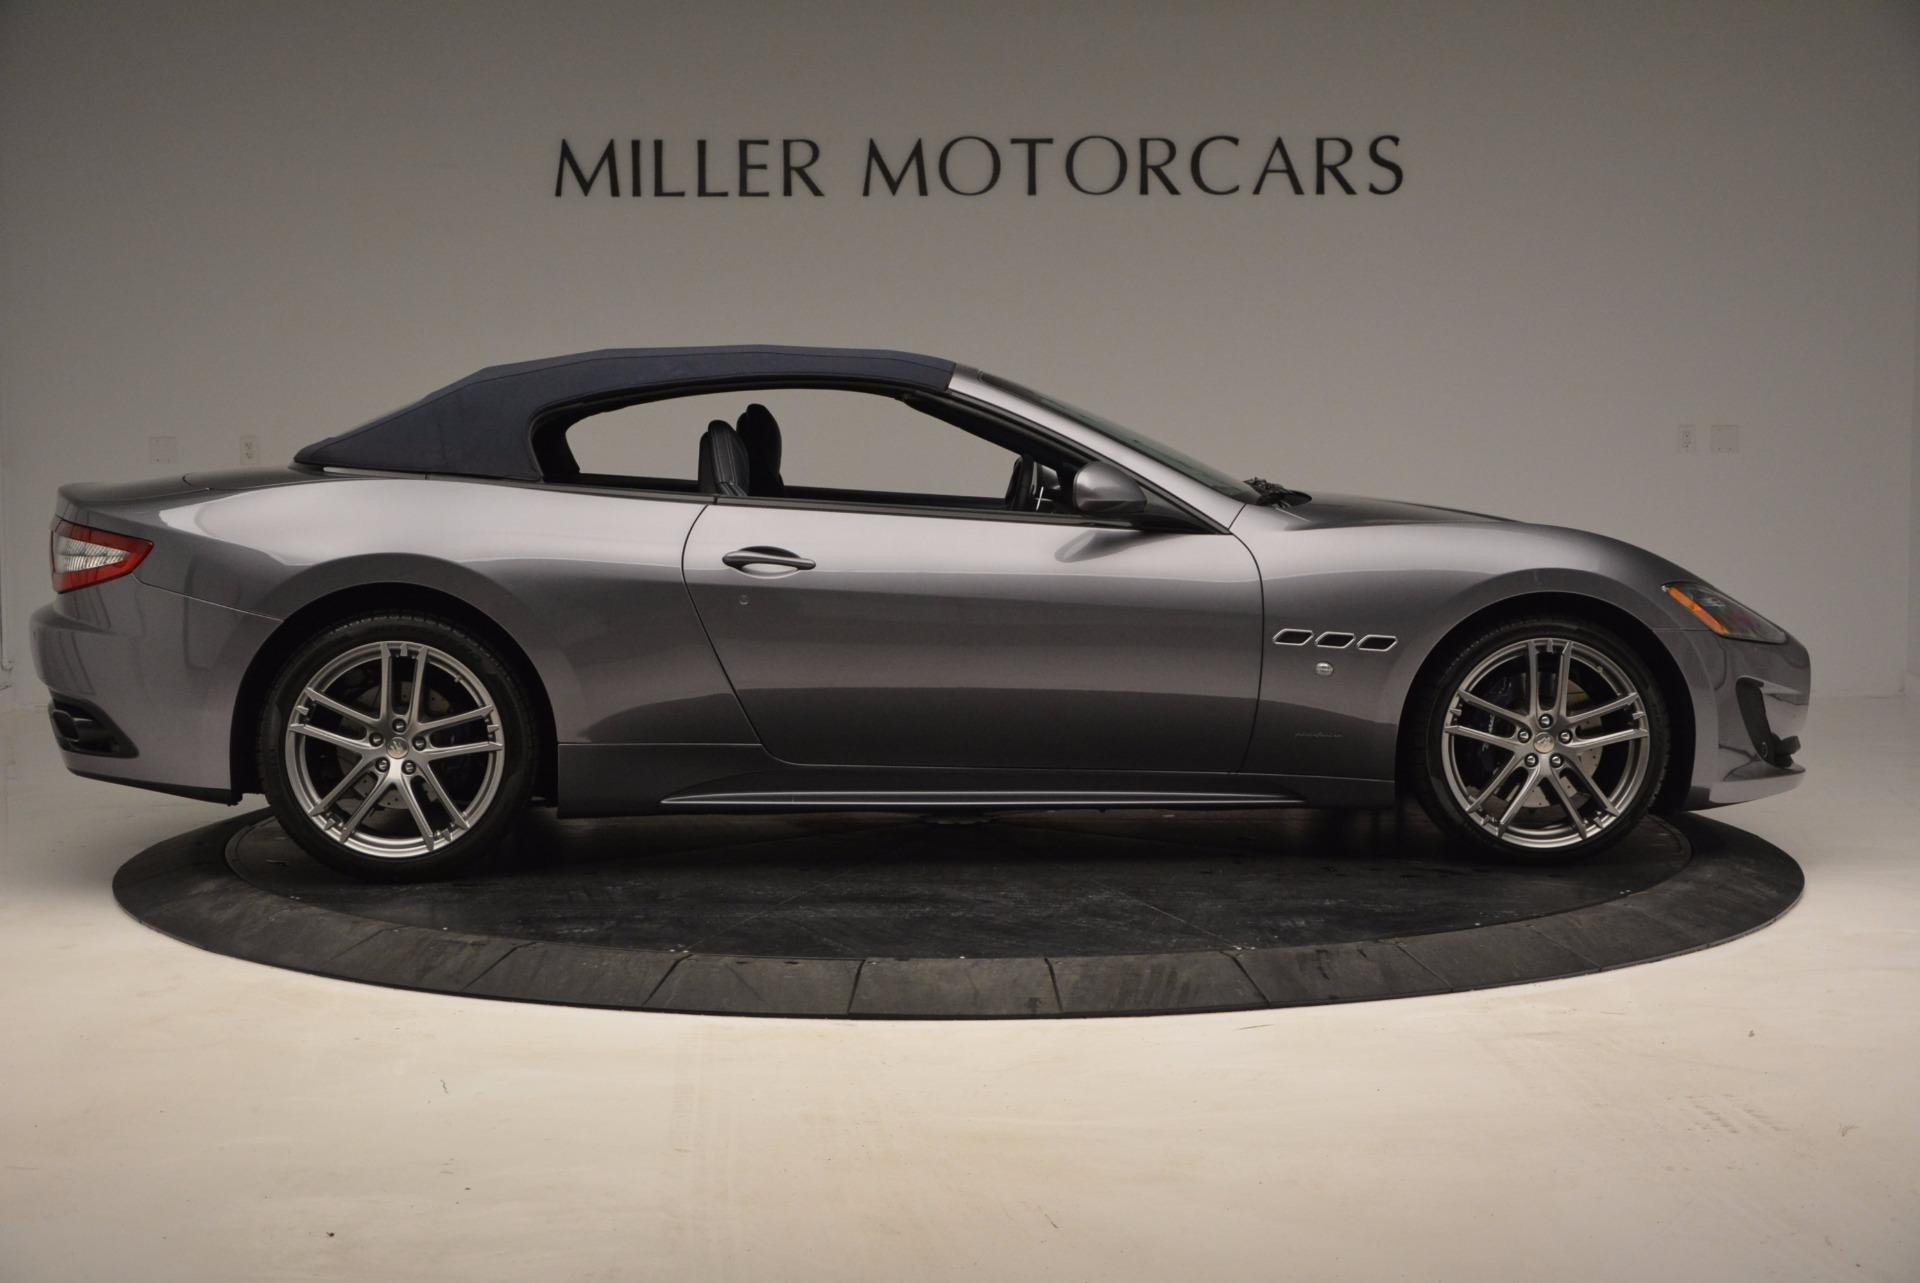 New 2016 Maserati GranTurismo Convertible Sport For Sale In Westport, CT 154_p14